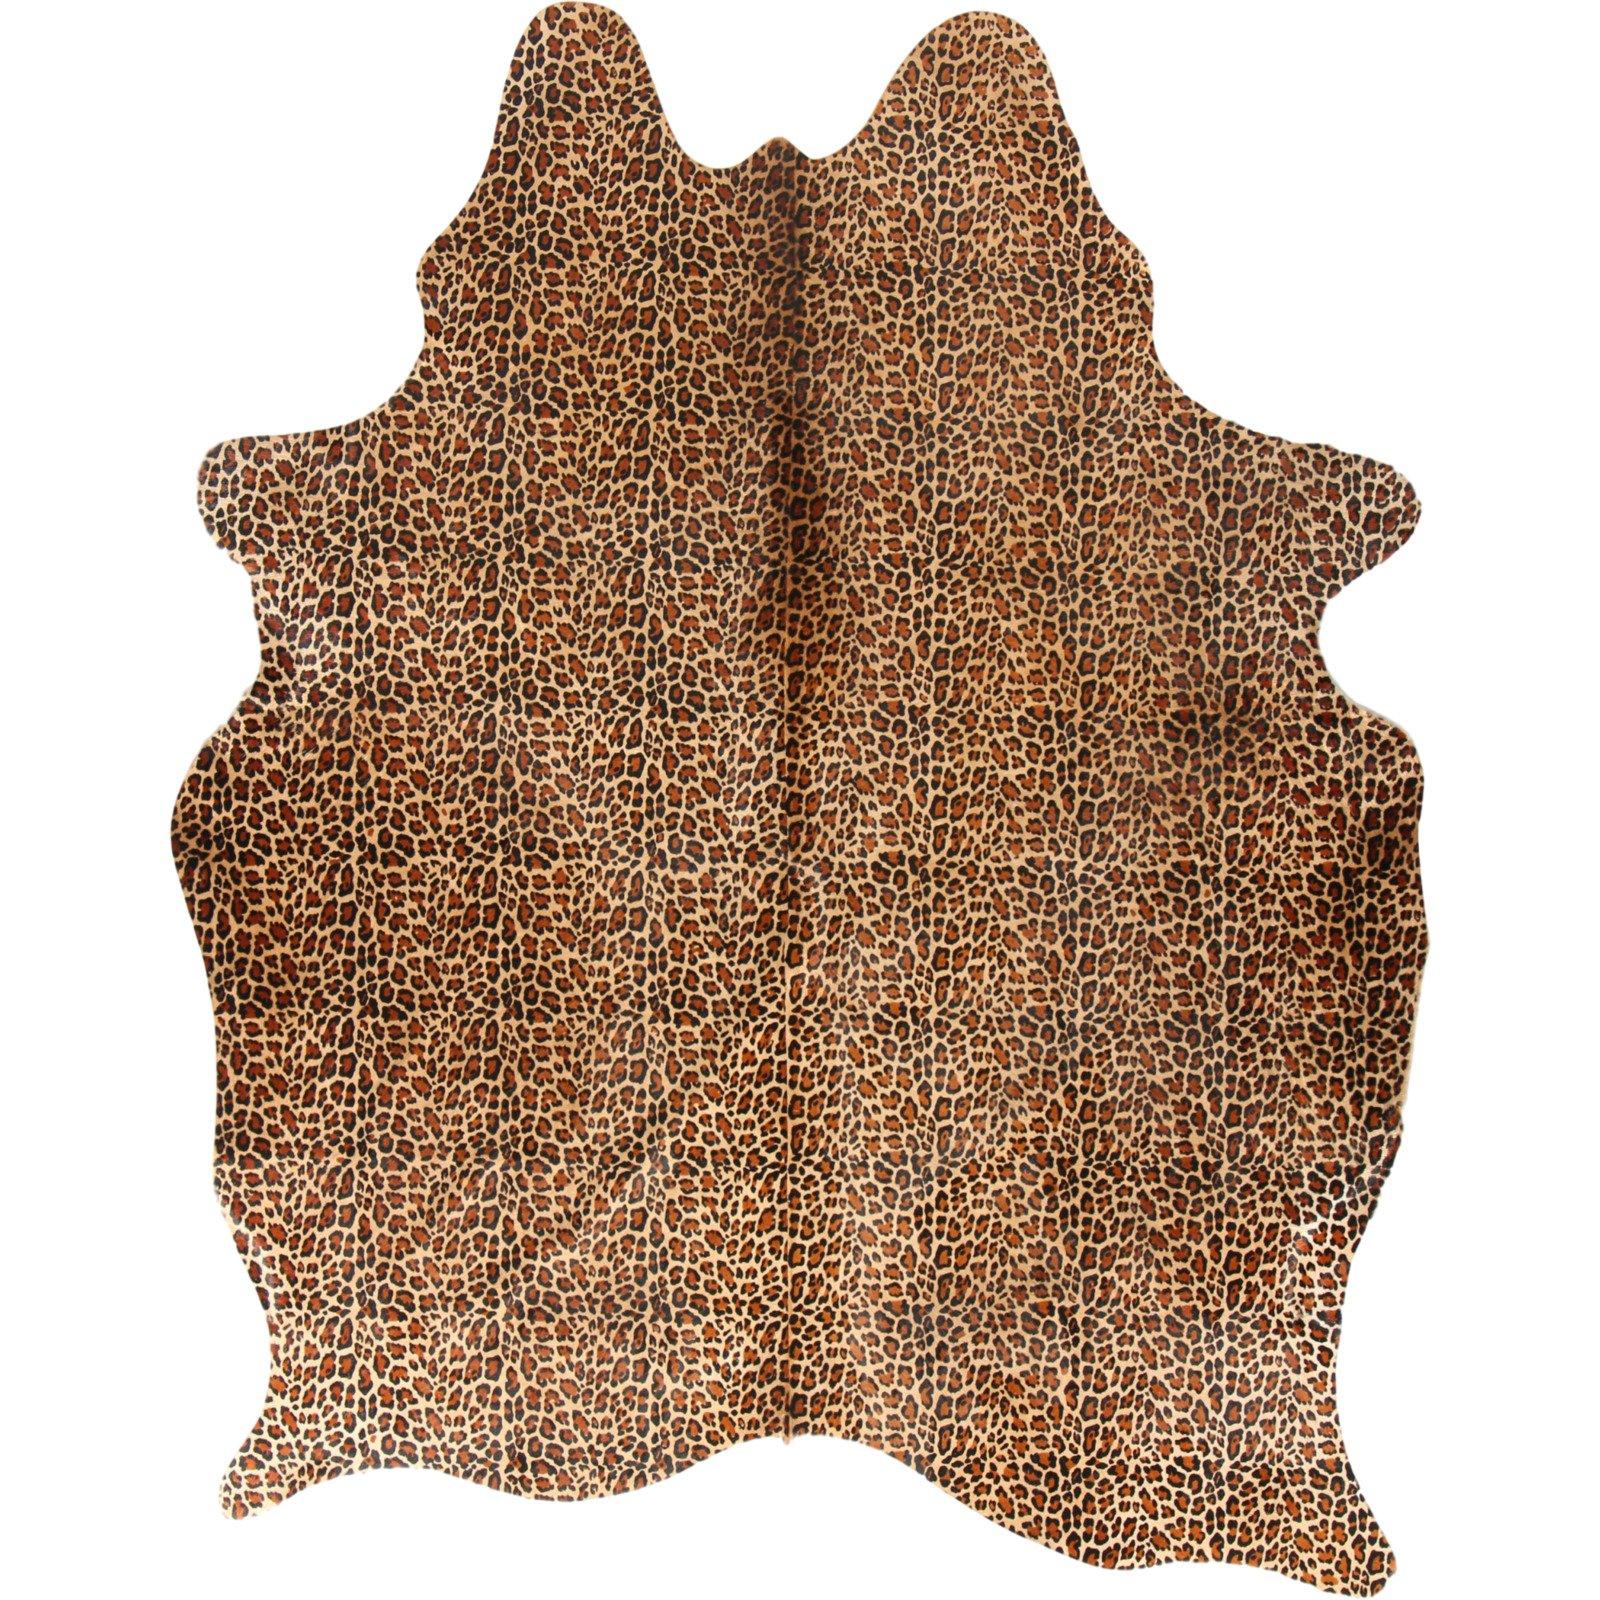 peau de vache safari leopard 3 4m2 jaune noir esbeco jaune